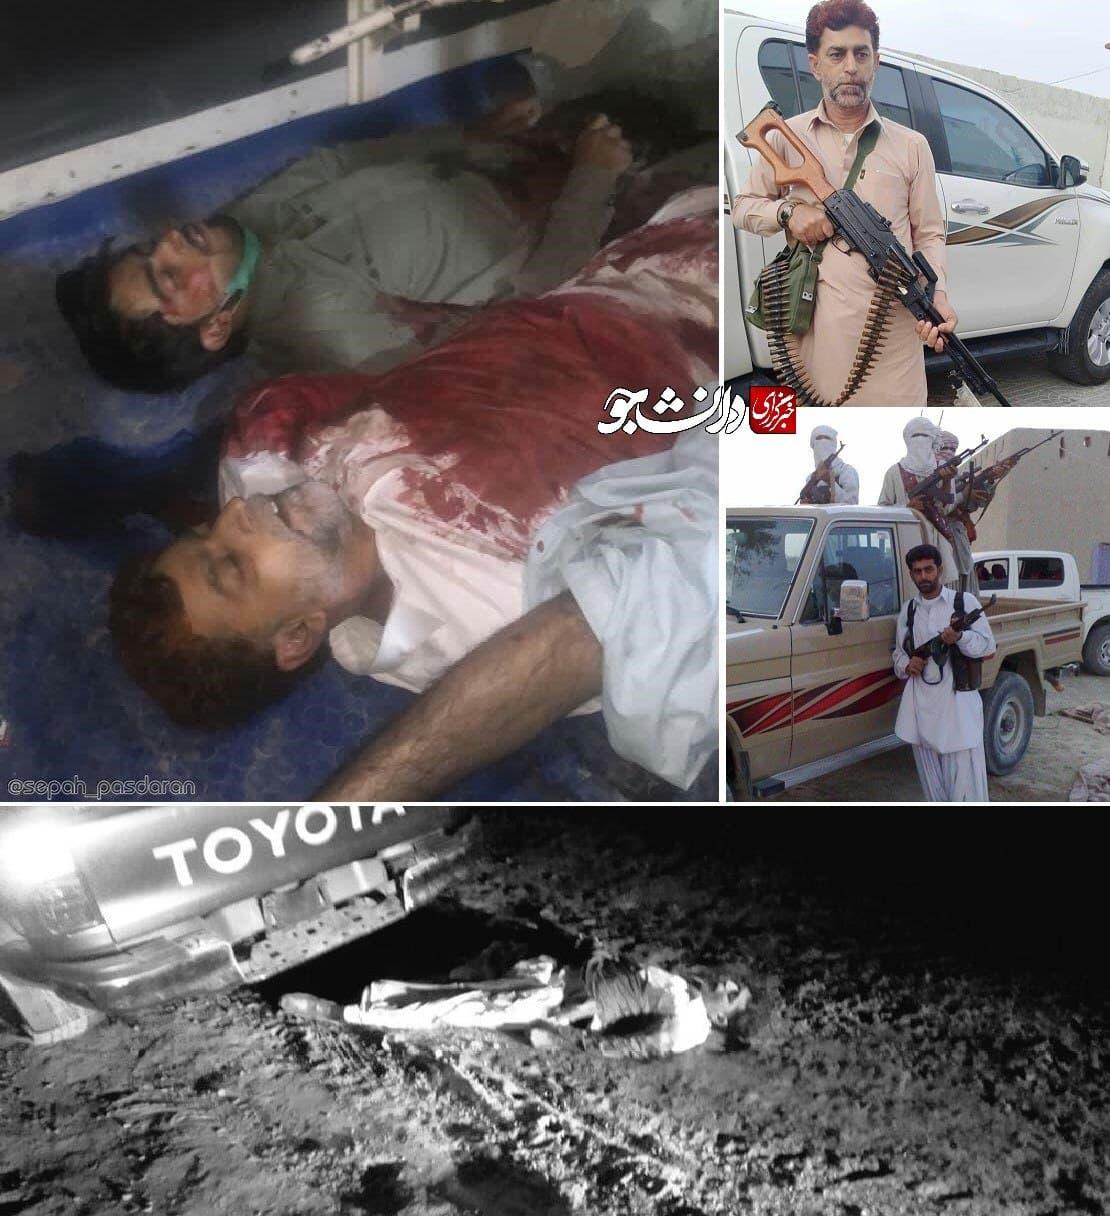 سرکرده جیشالعدل کشته شد؟ +عکس